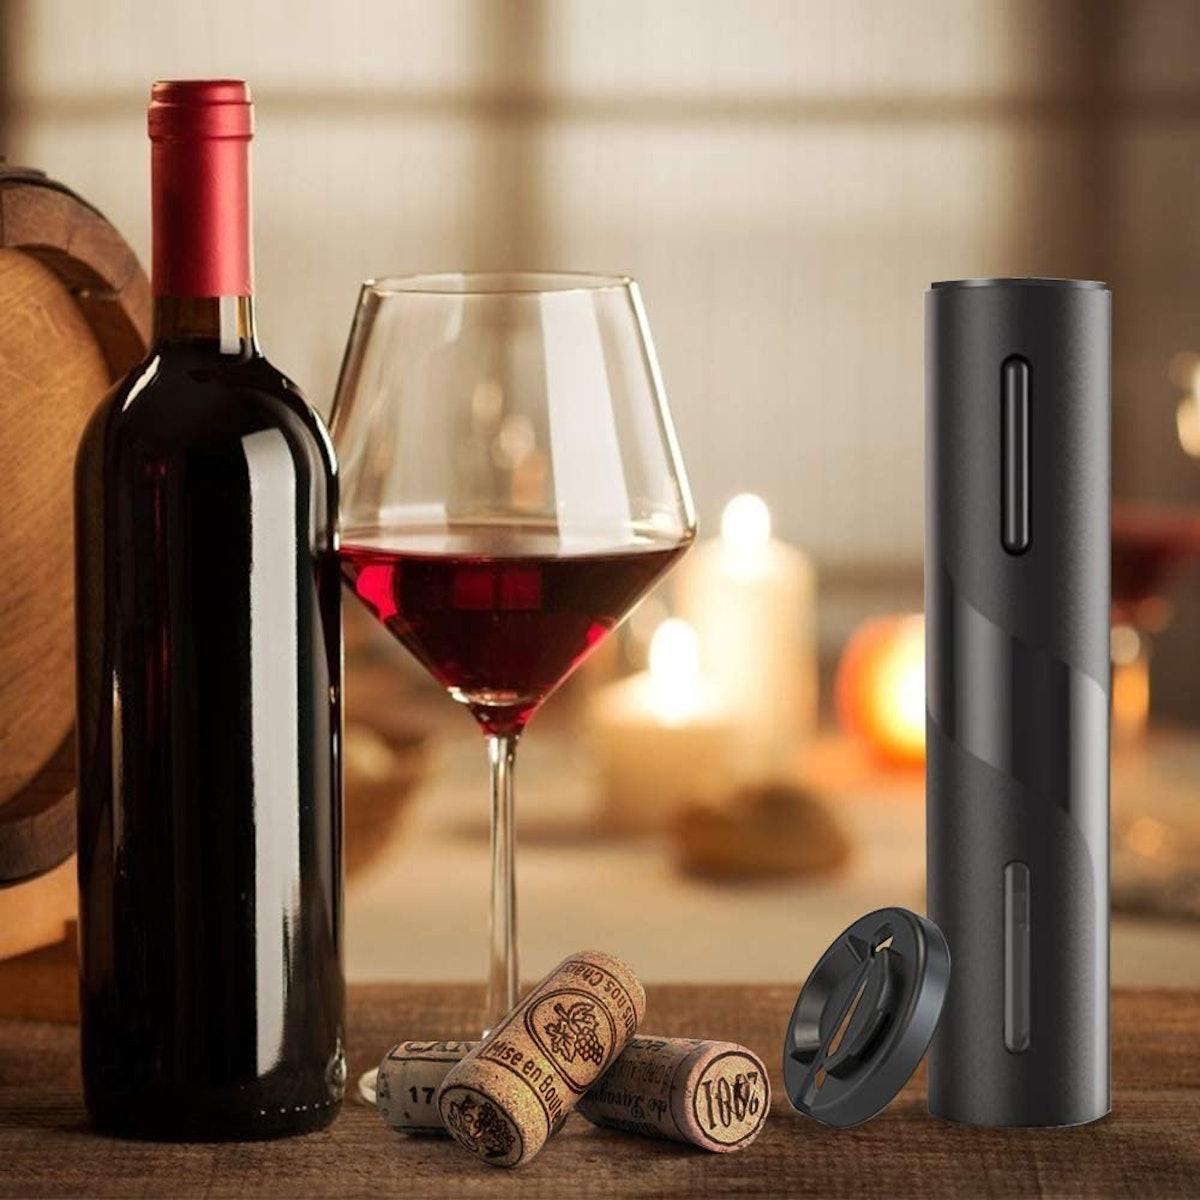 Cokunst Electric Wine Opener